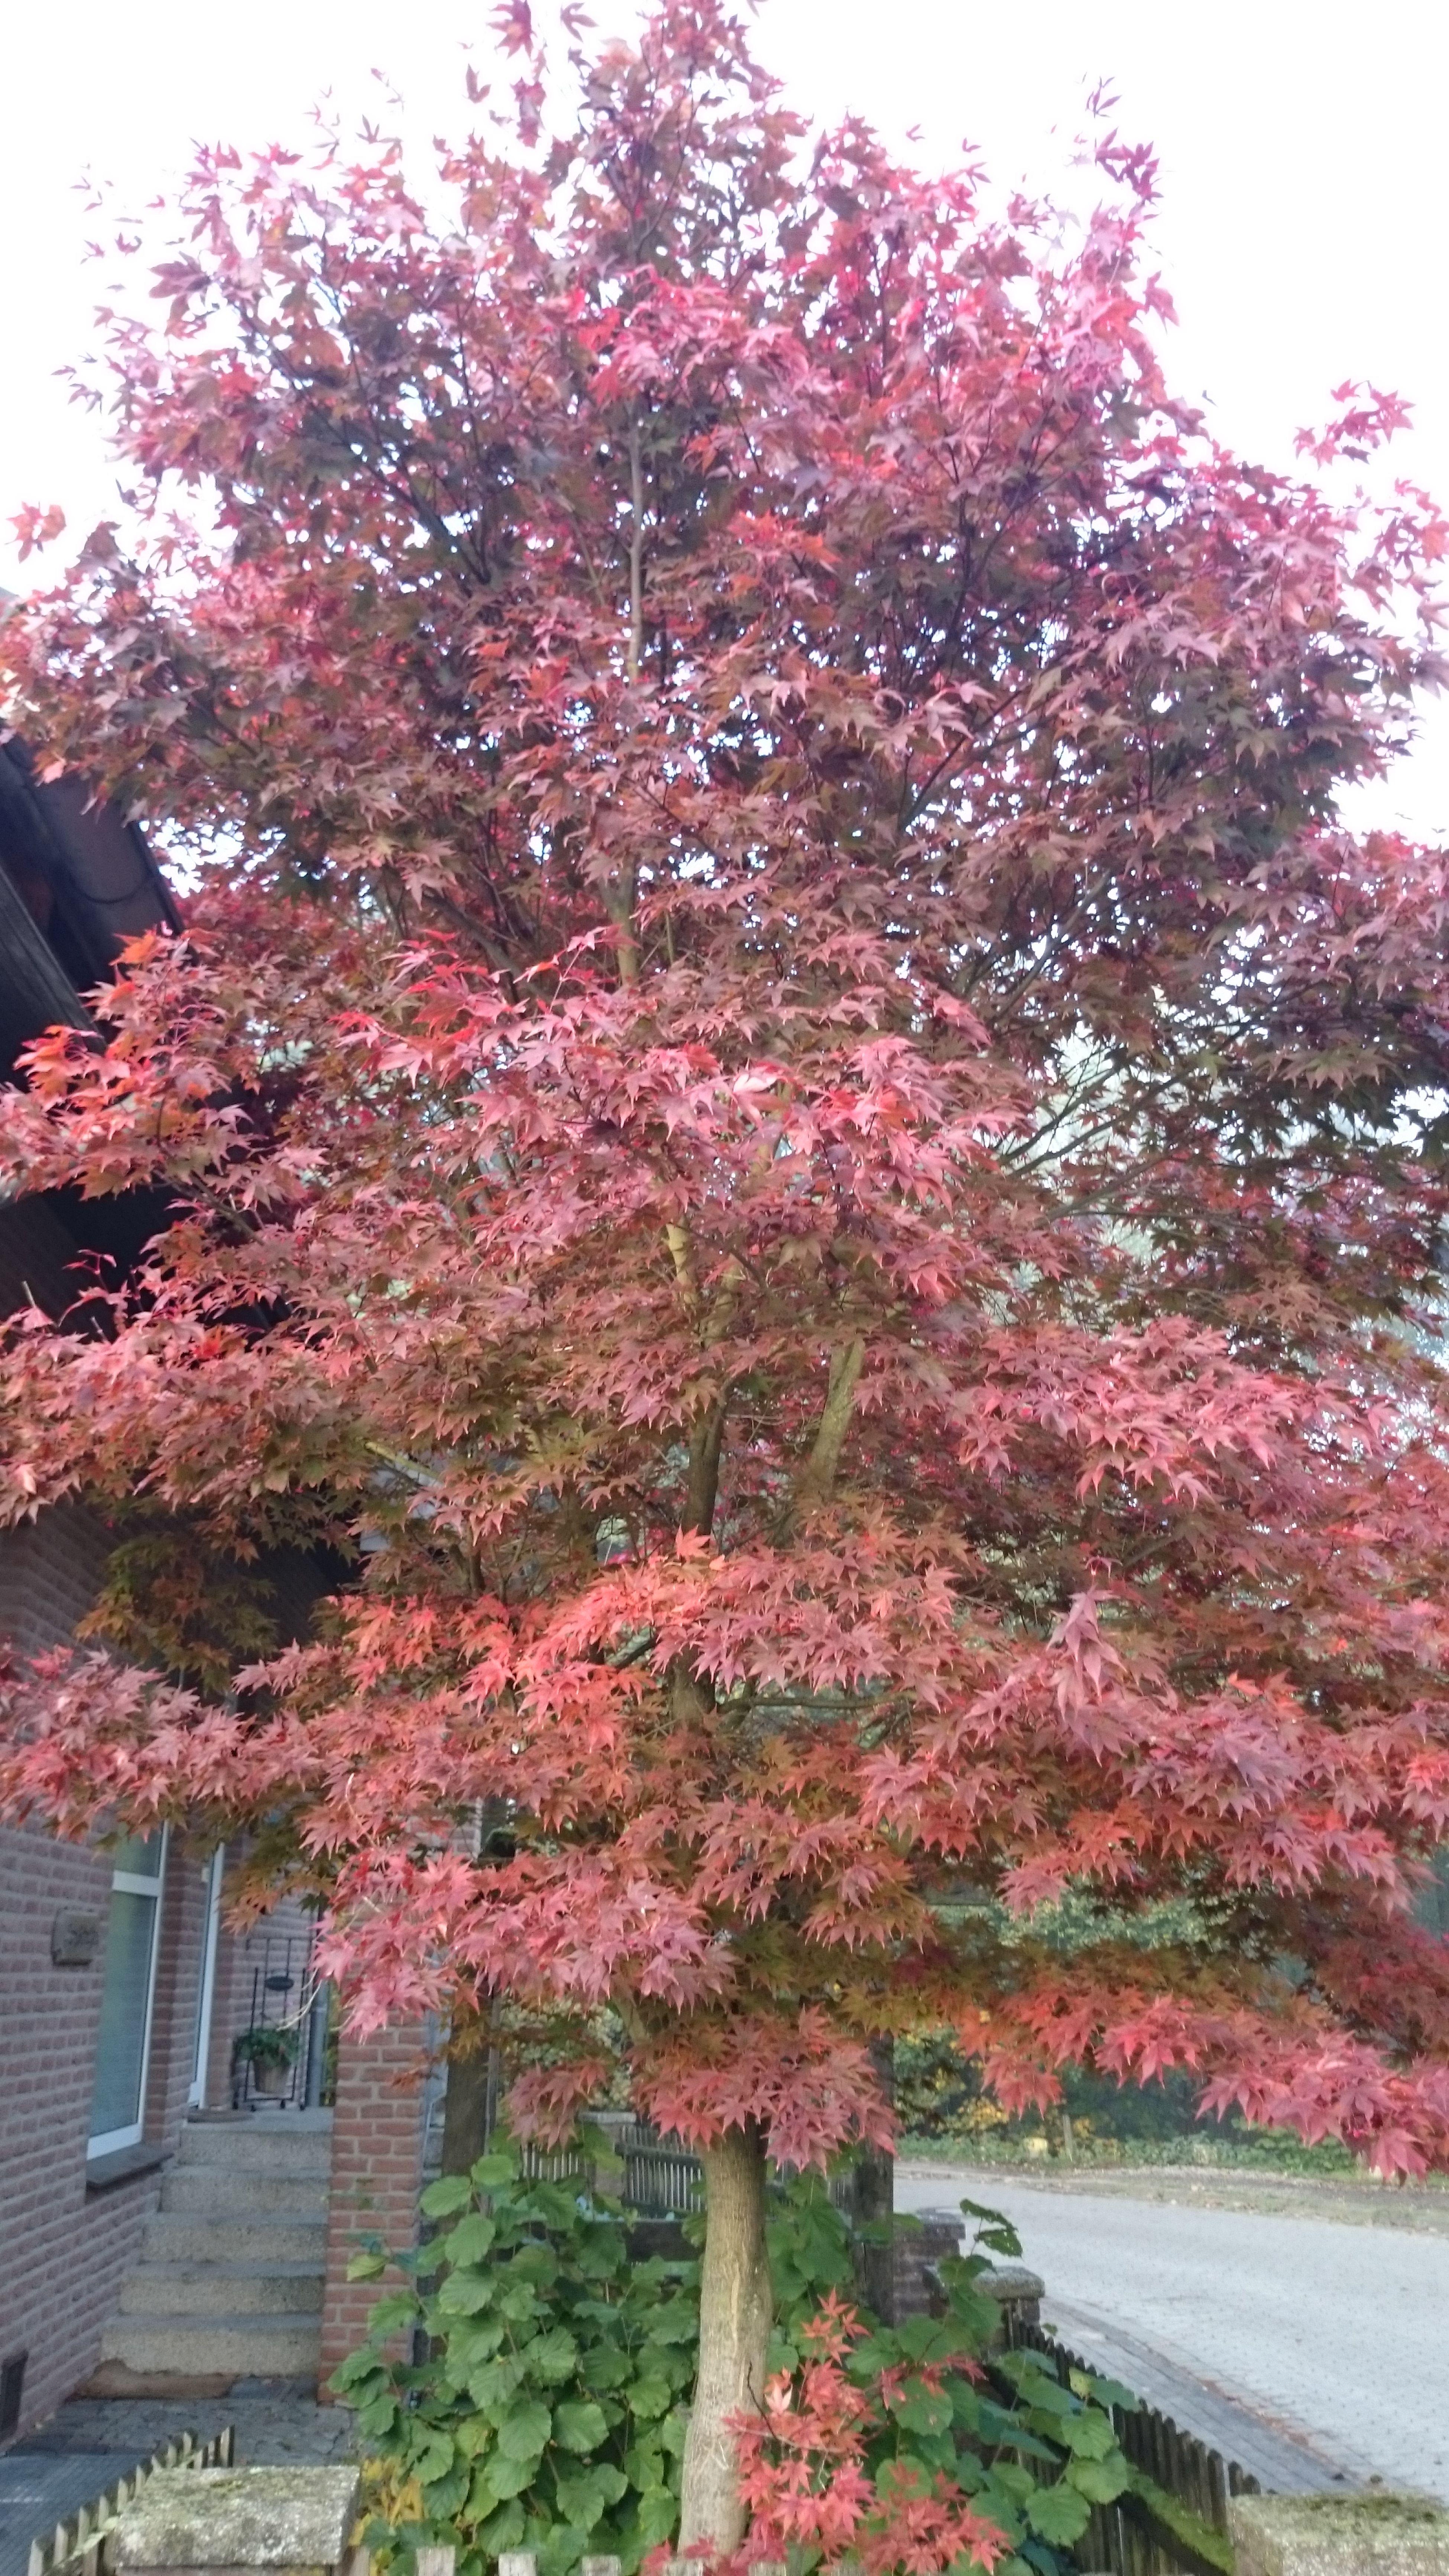 My Indian Summer Dwarf Mahogany 32 Jahre Alt EyeEm Gallery Zwergahorn Germany Nature Tree Red Tree